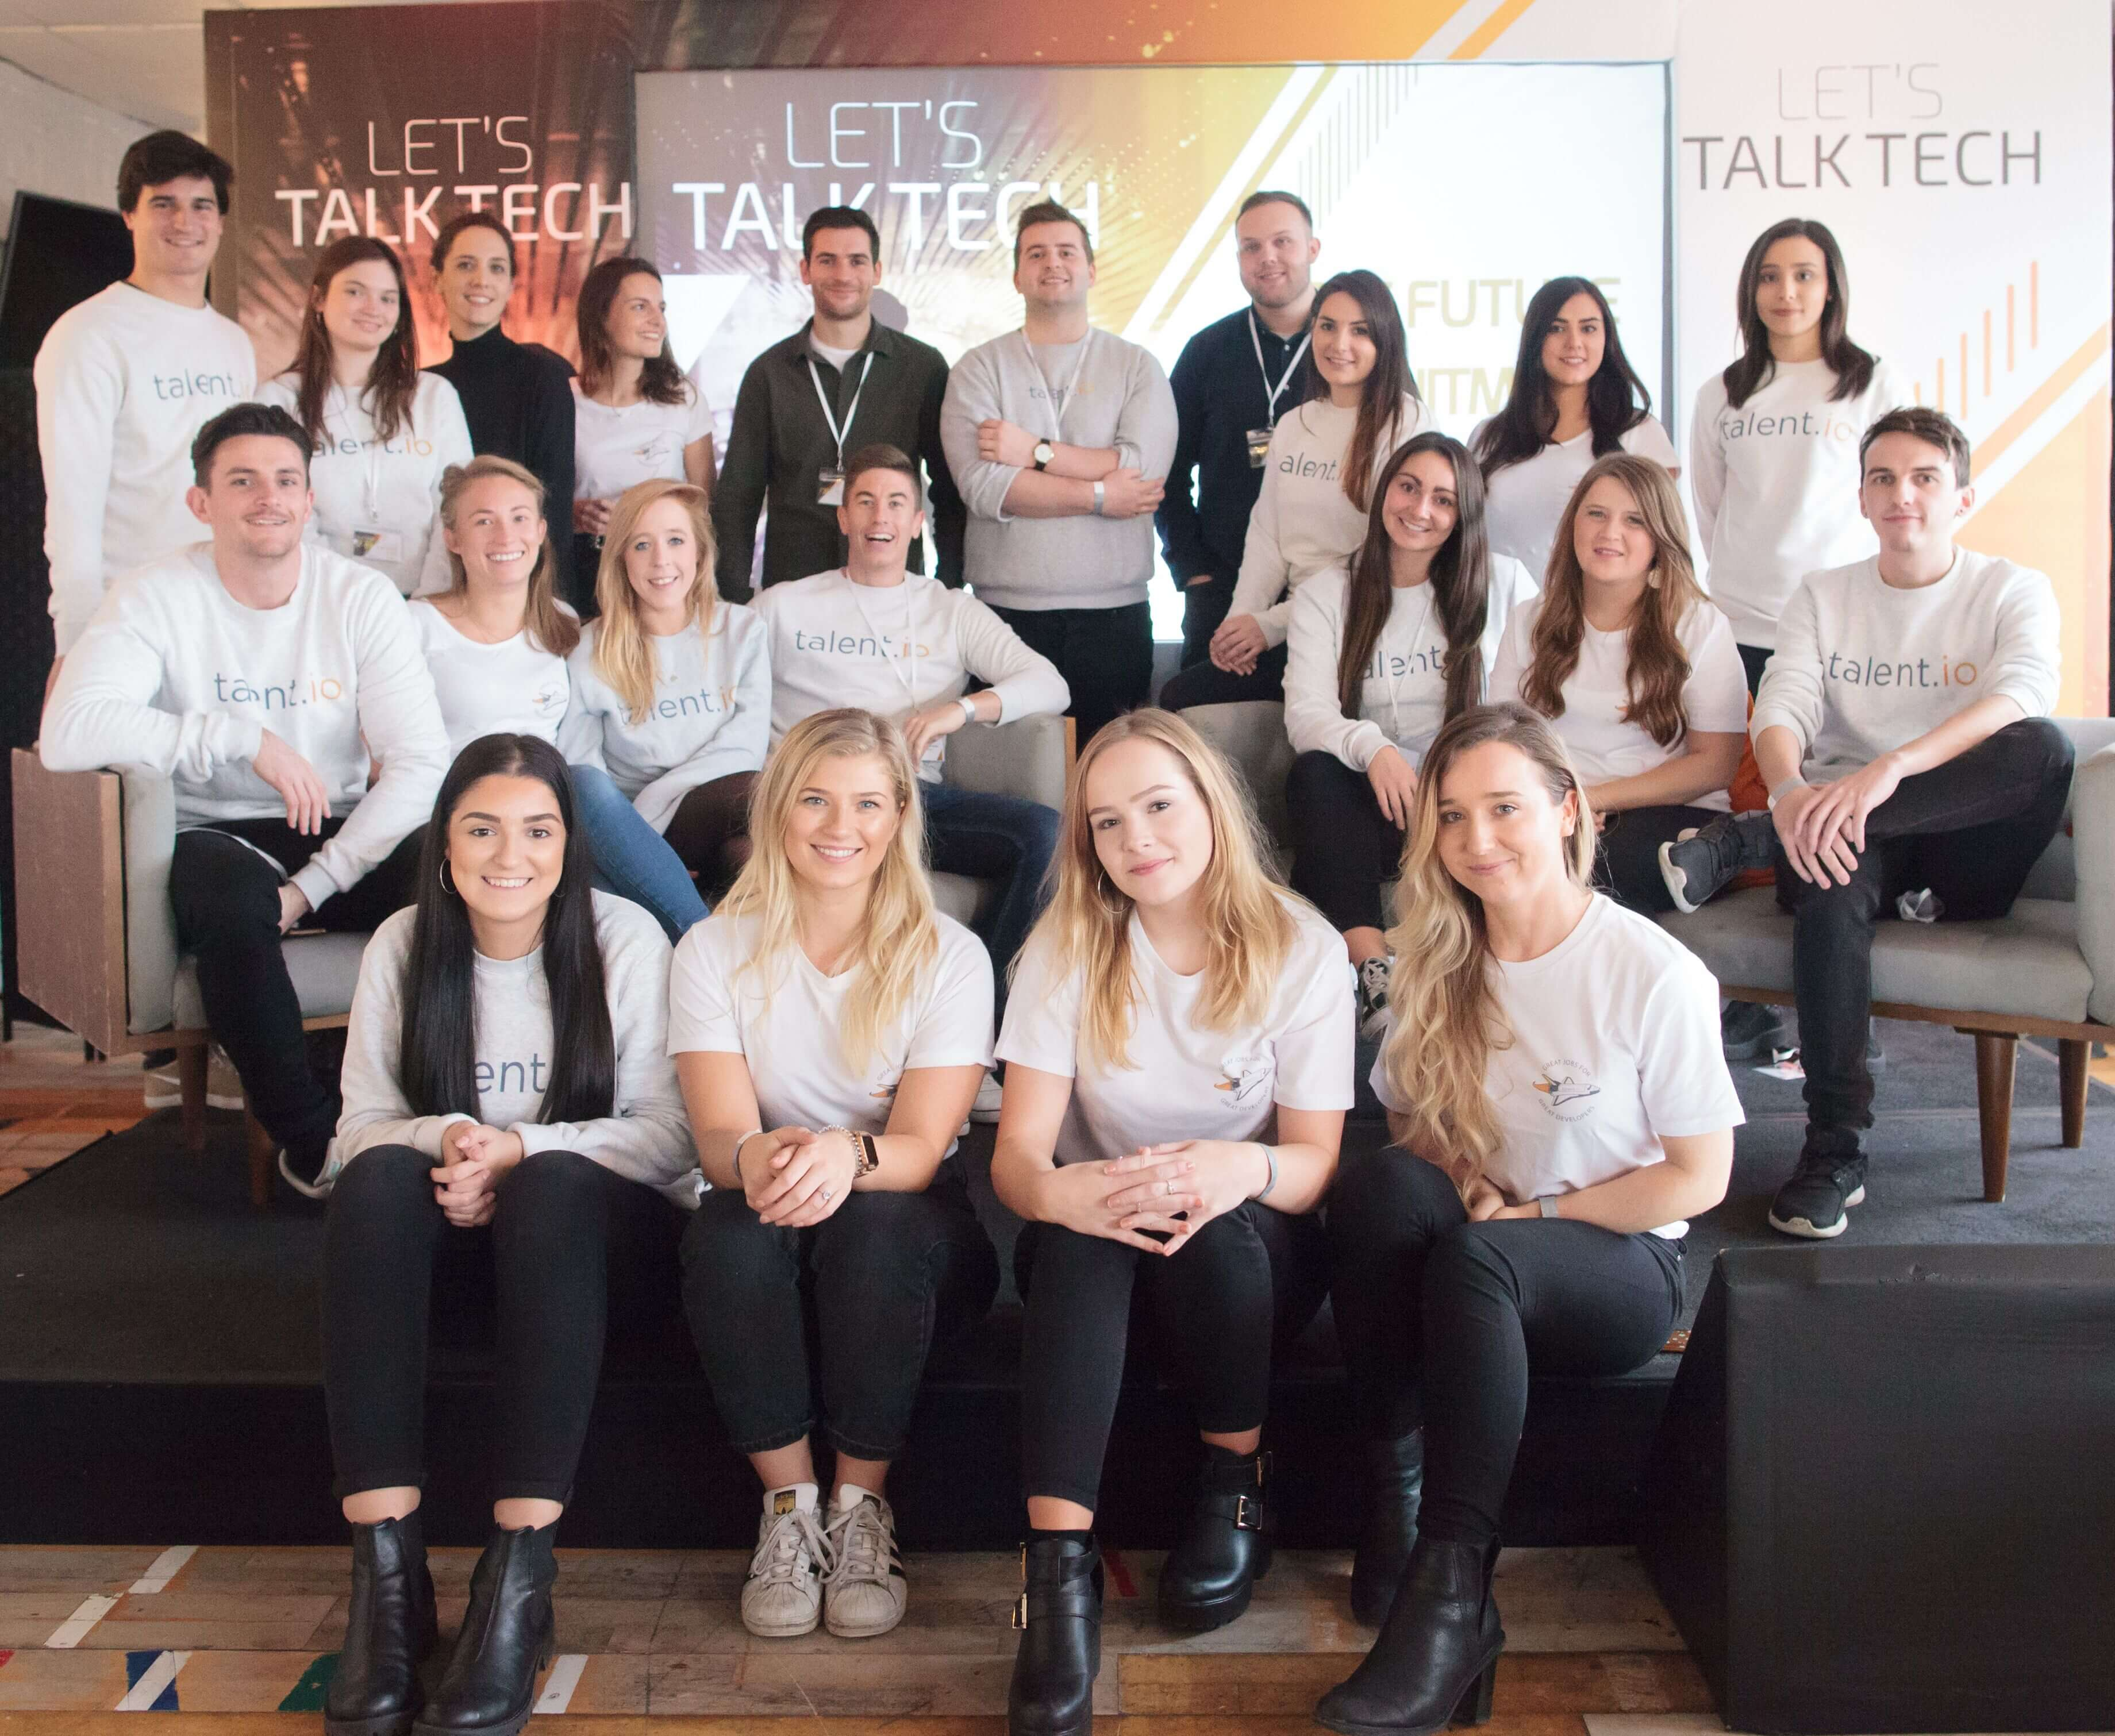 talent-io-tech-team